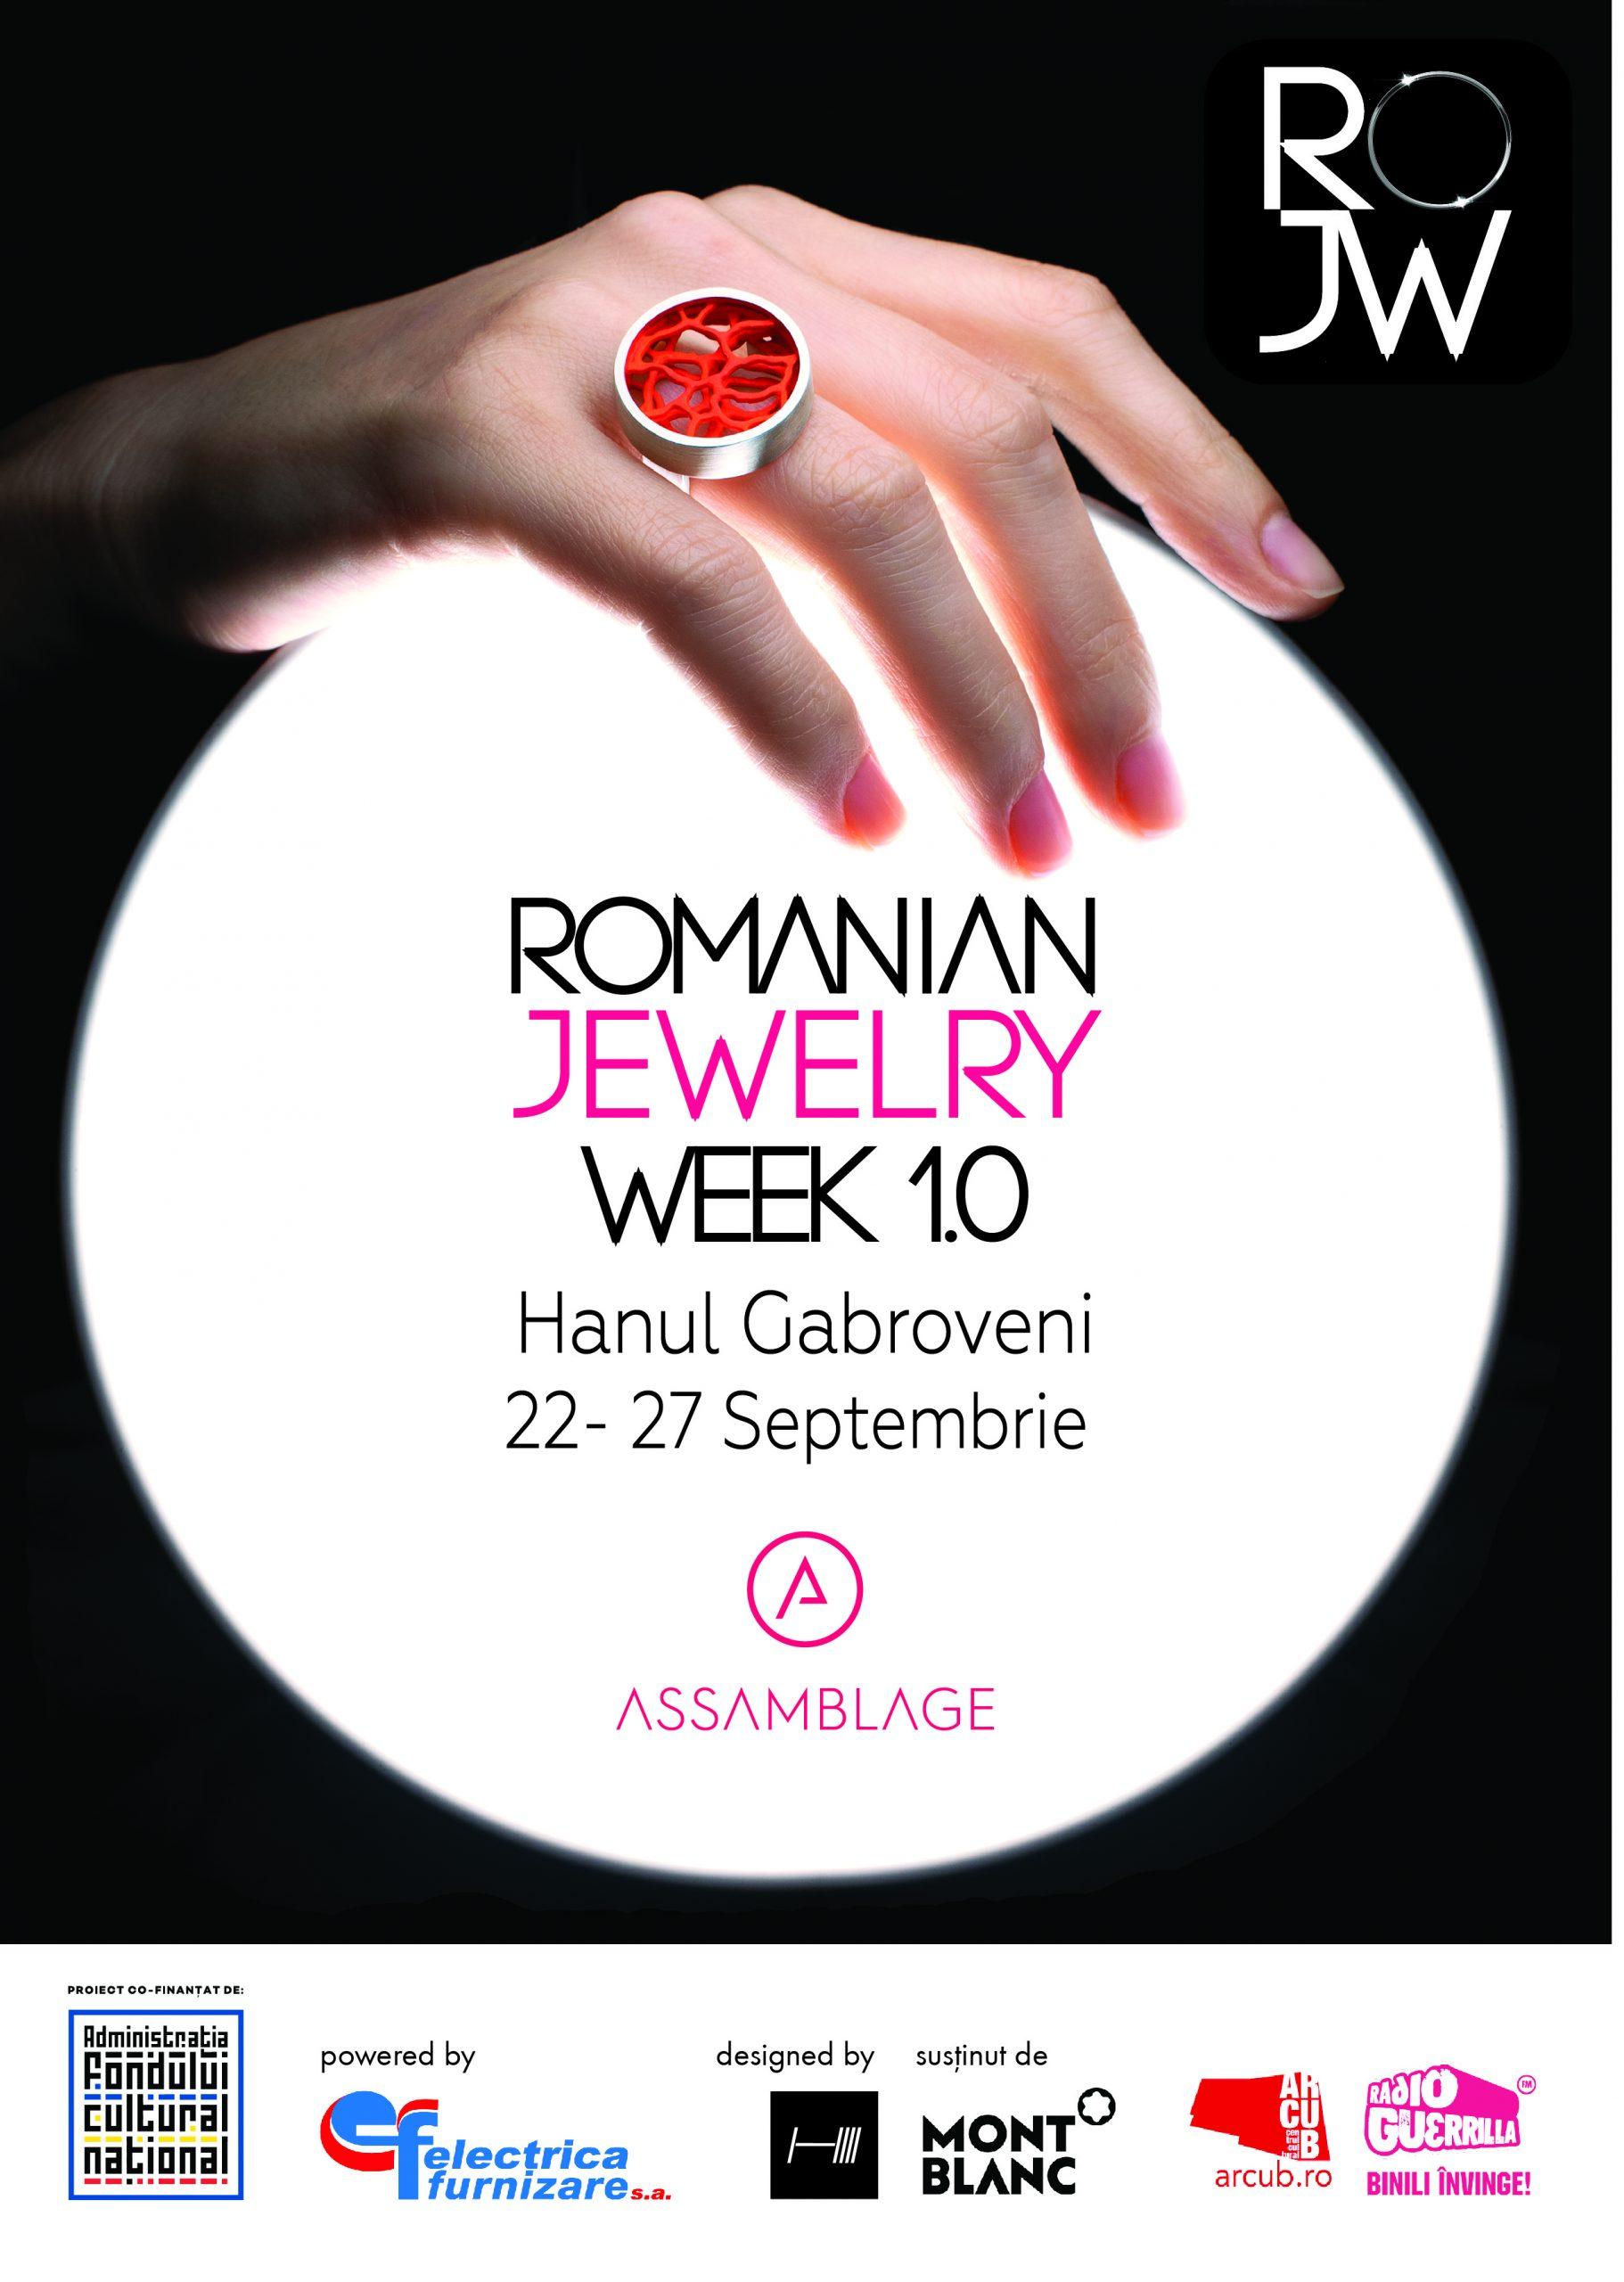 Assamblage anunta prima ediție ROMANIAN JEWELRY WEEK  22-27 septembrie 2020